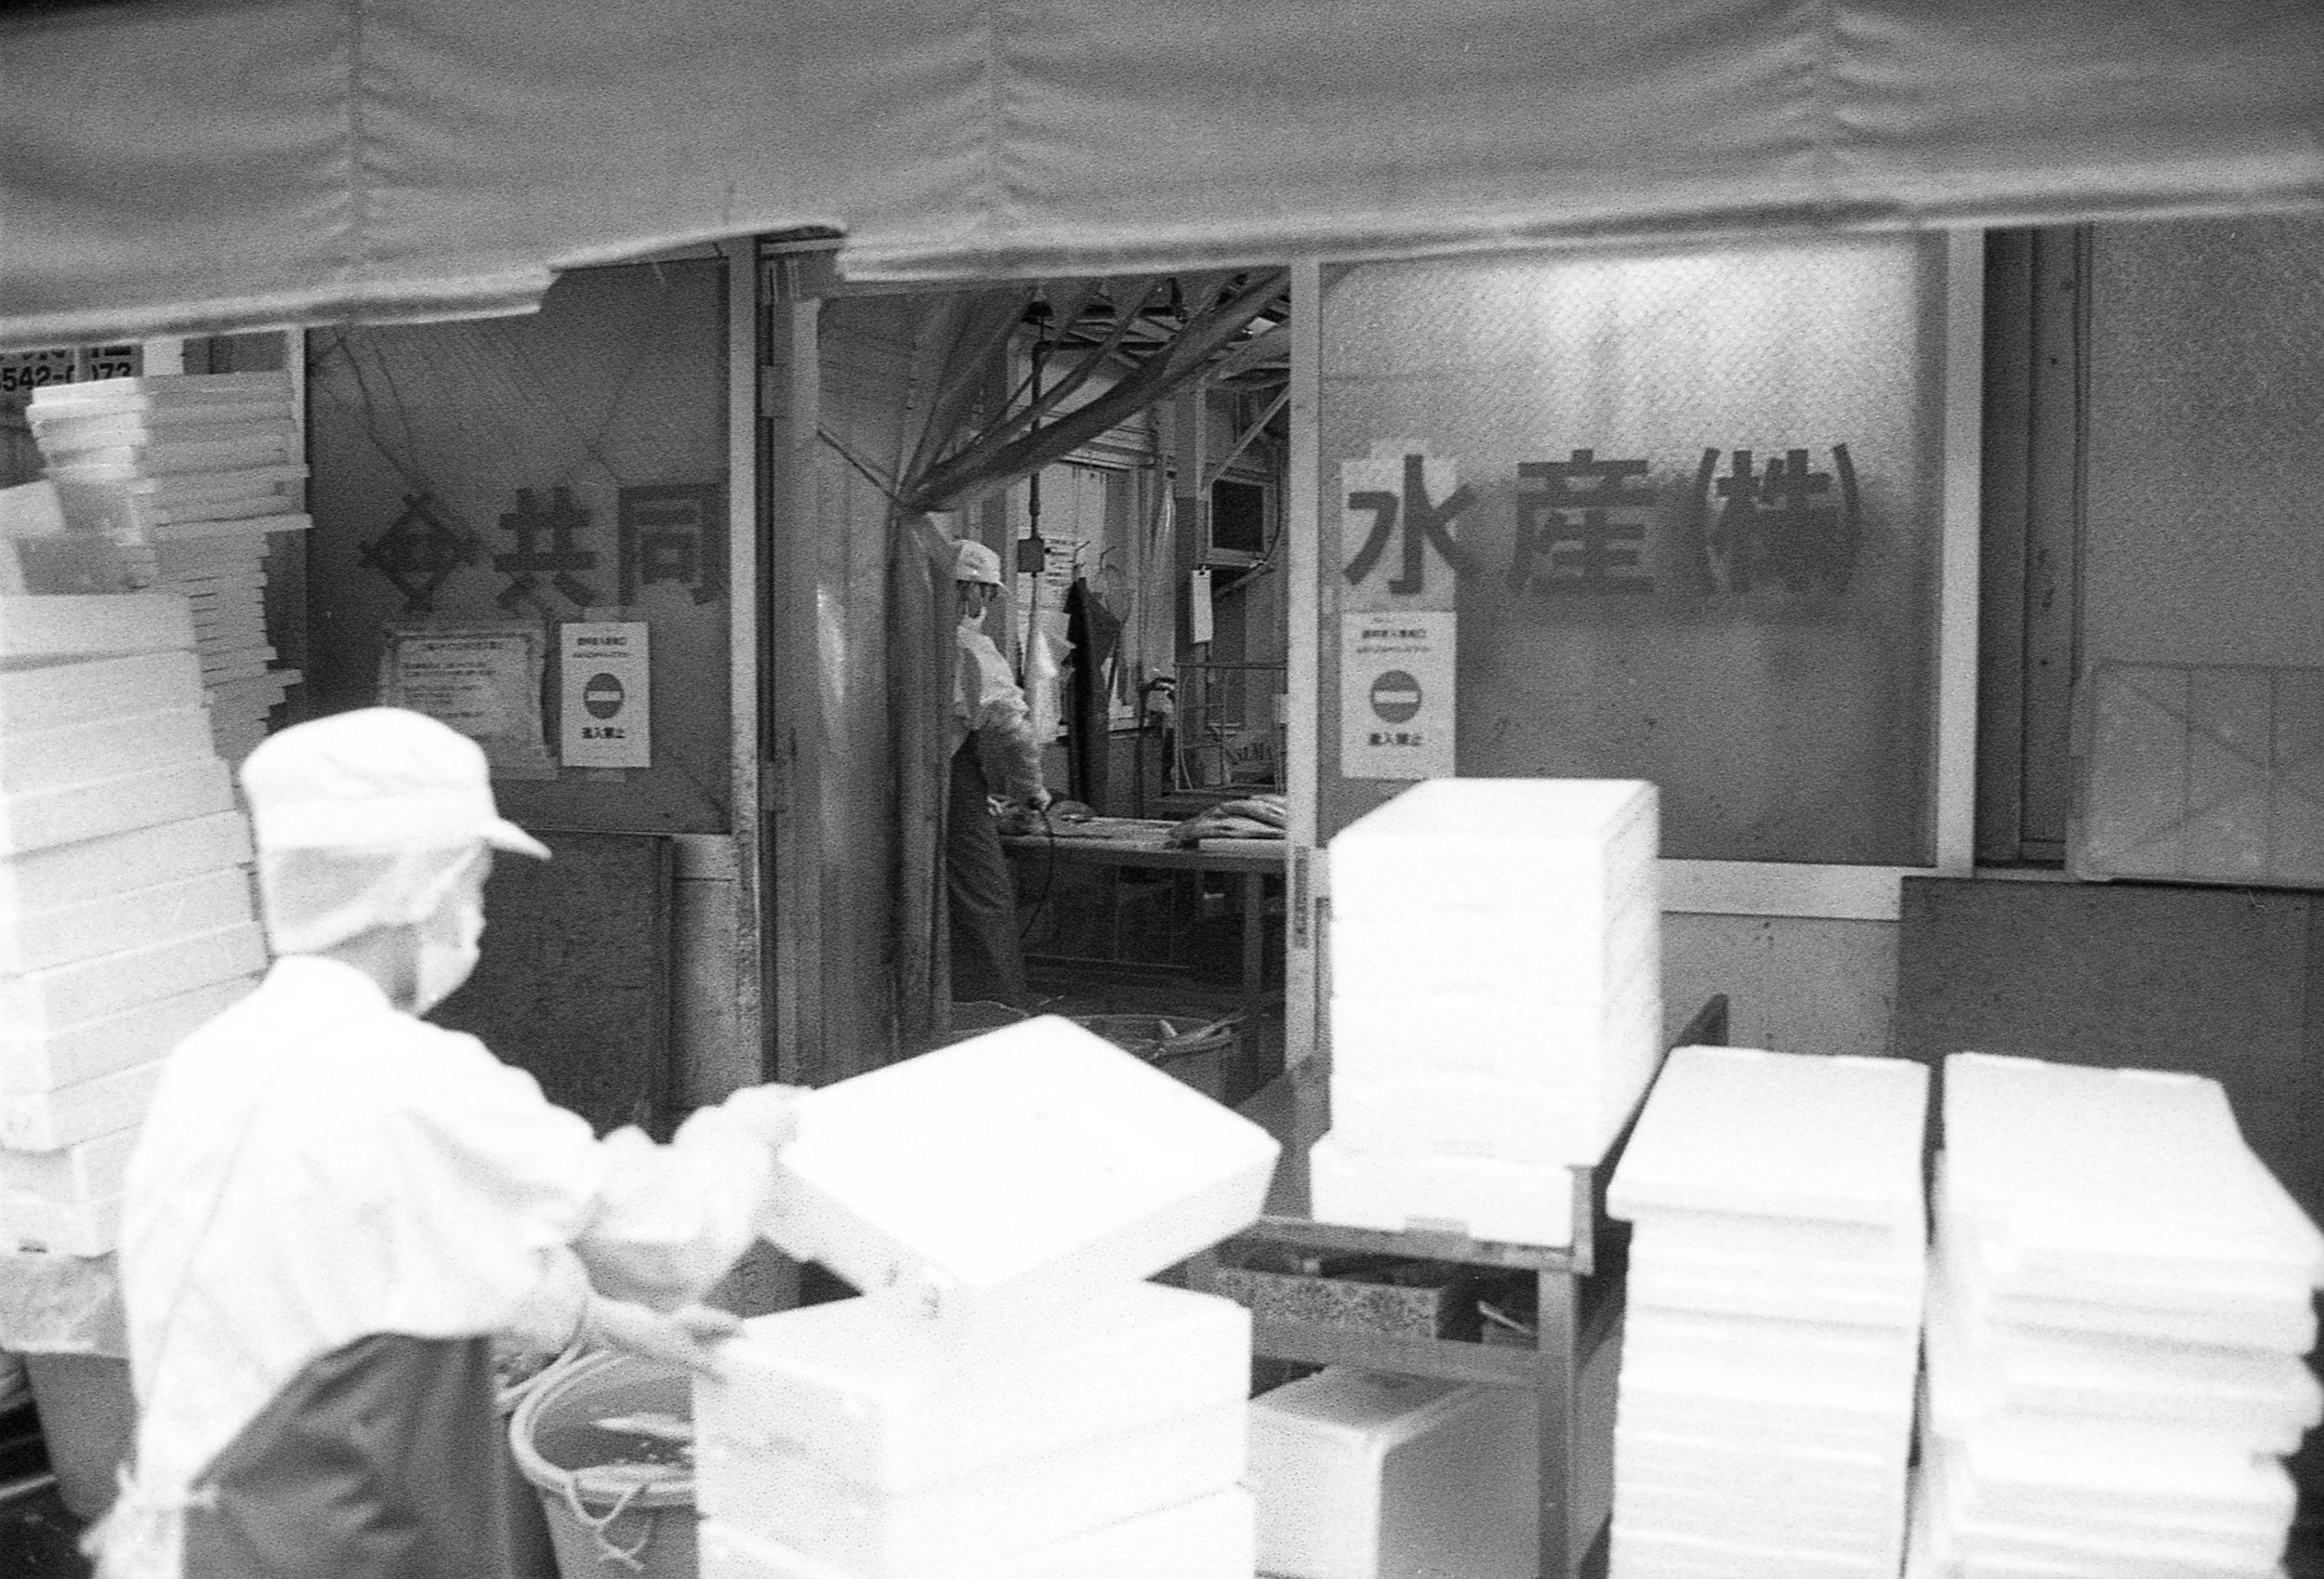 20180827_29_Hiroshima_032.jpg